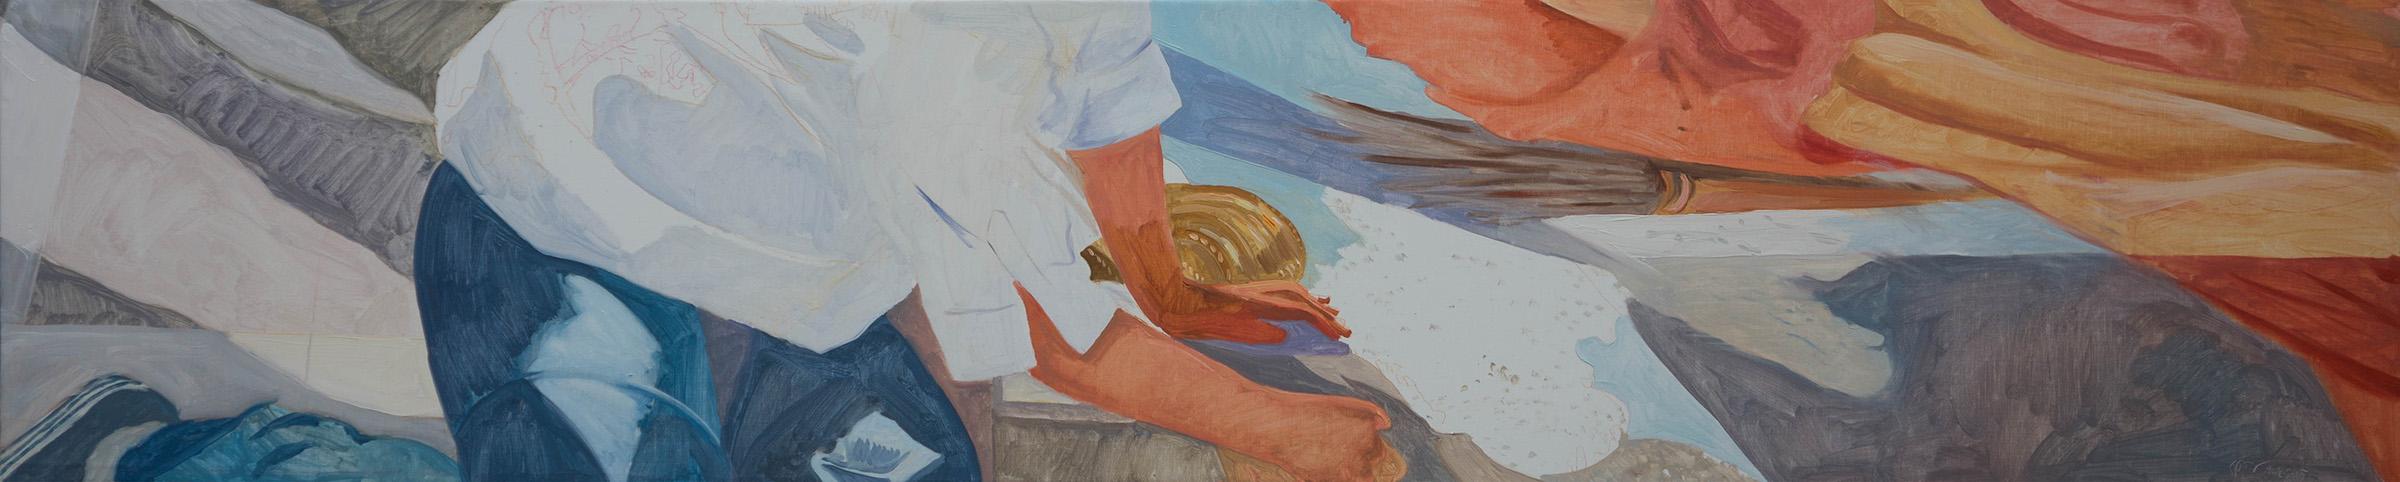 "ANO KATO 30  12""x60"" oil on portrait linen  based on photos i shot in 2010 of a sidewalk artist in  denver, co."